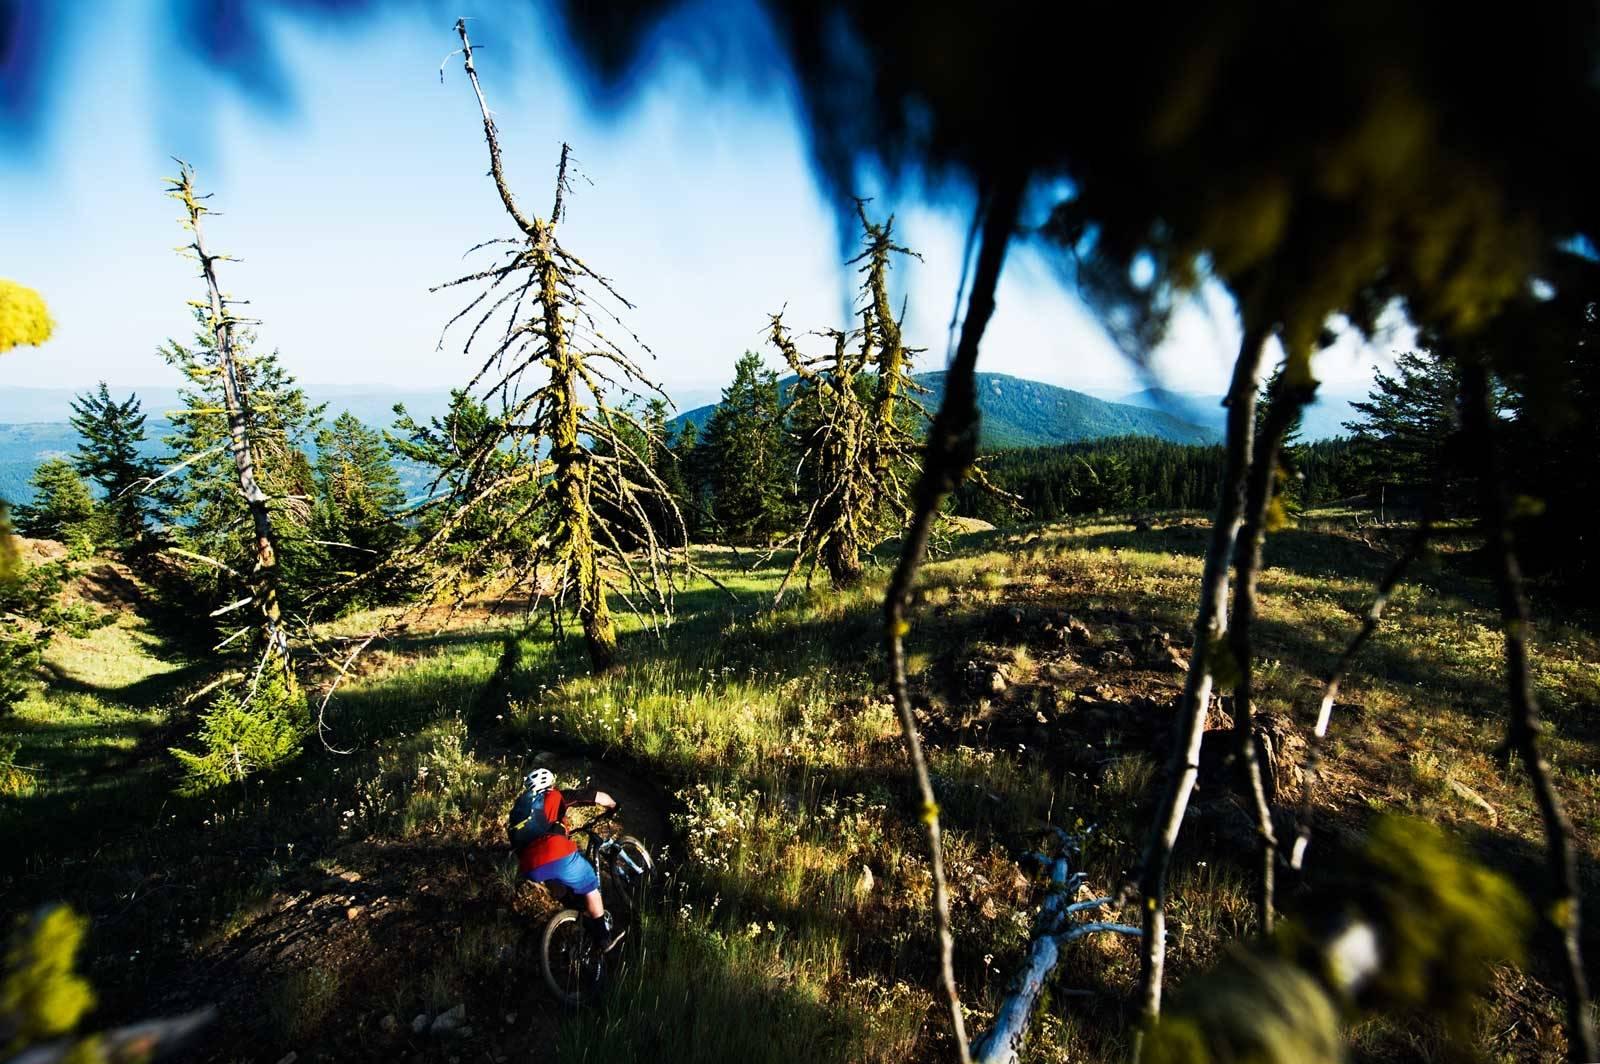 Stisykling-guide-British-Columbia-Rossland-1